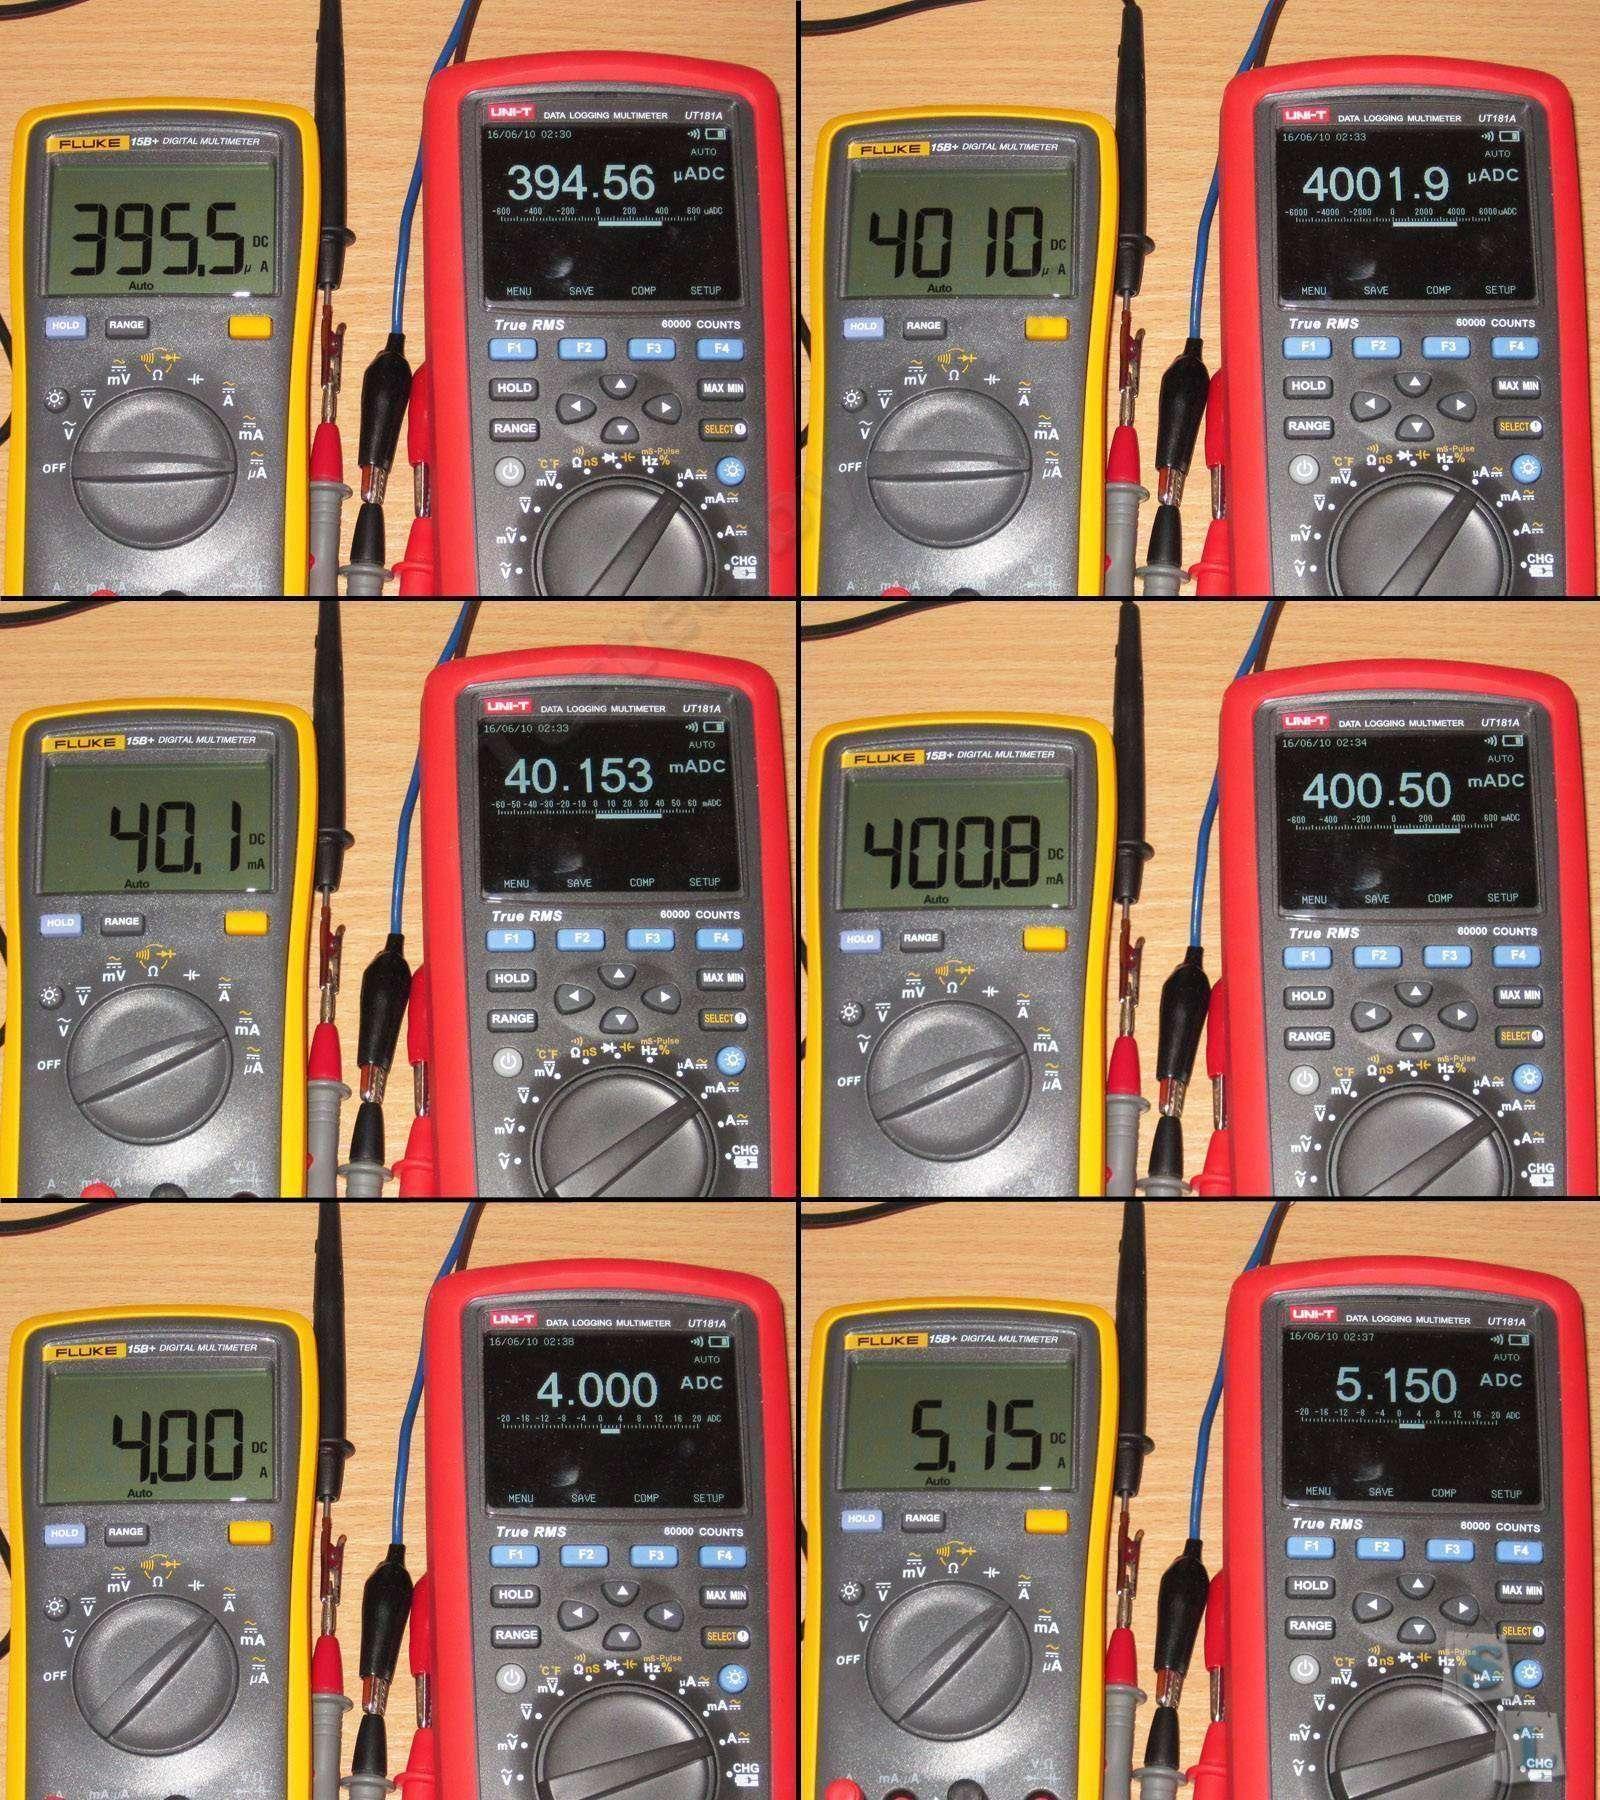 GearBest: FLUKE - 15B+, надежно, качественно, дорого